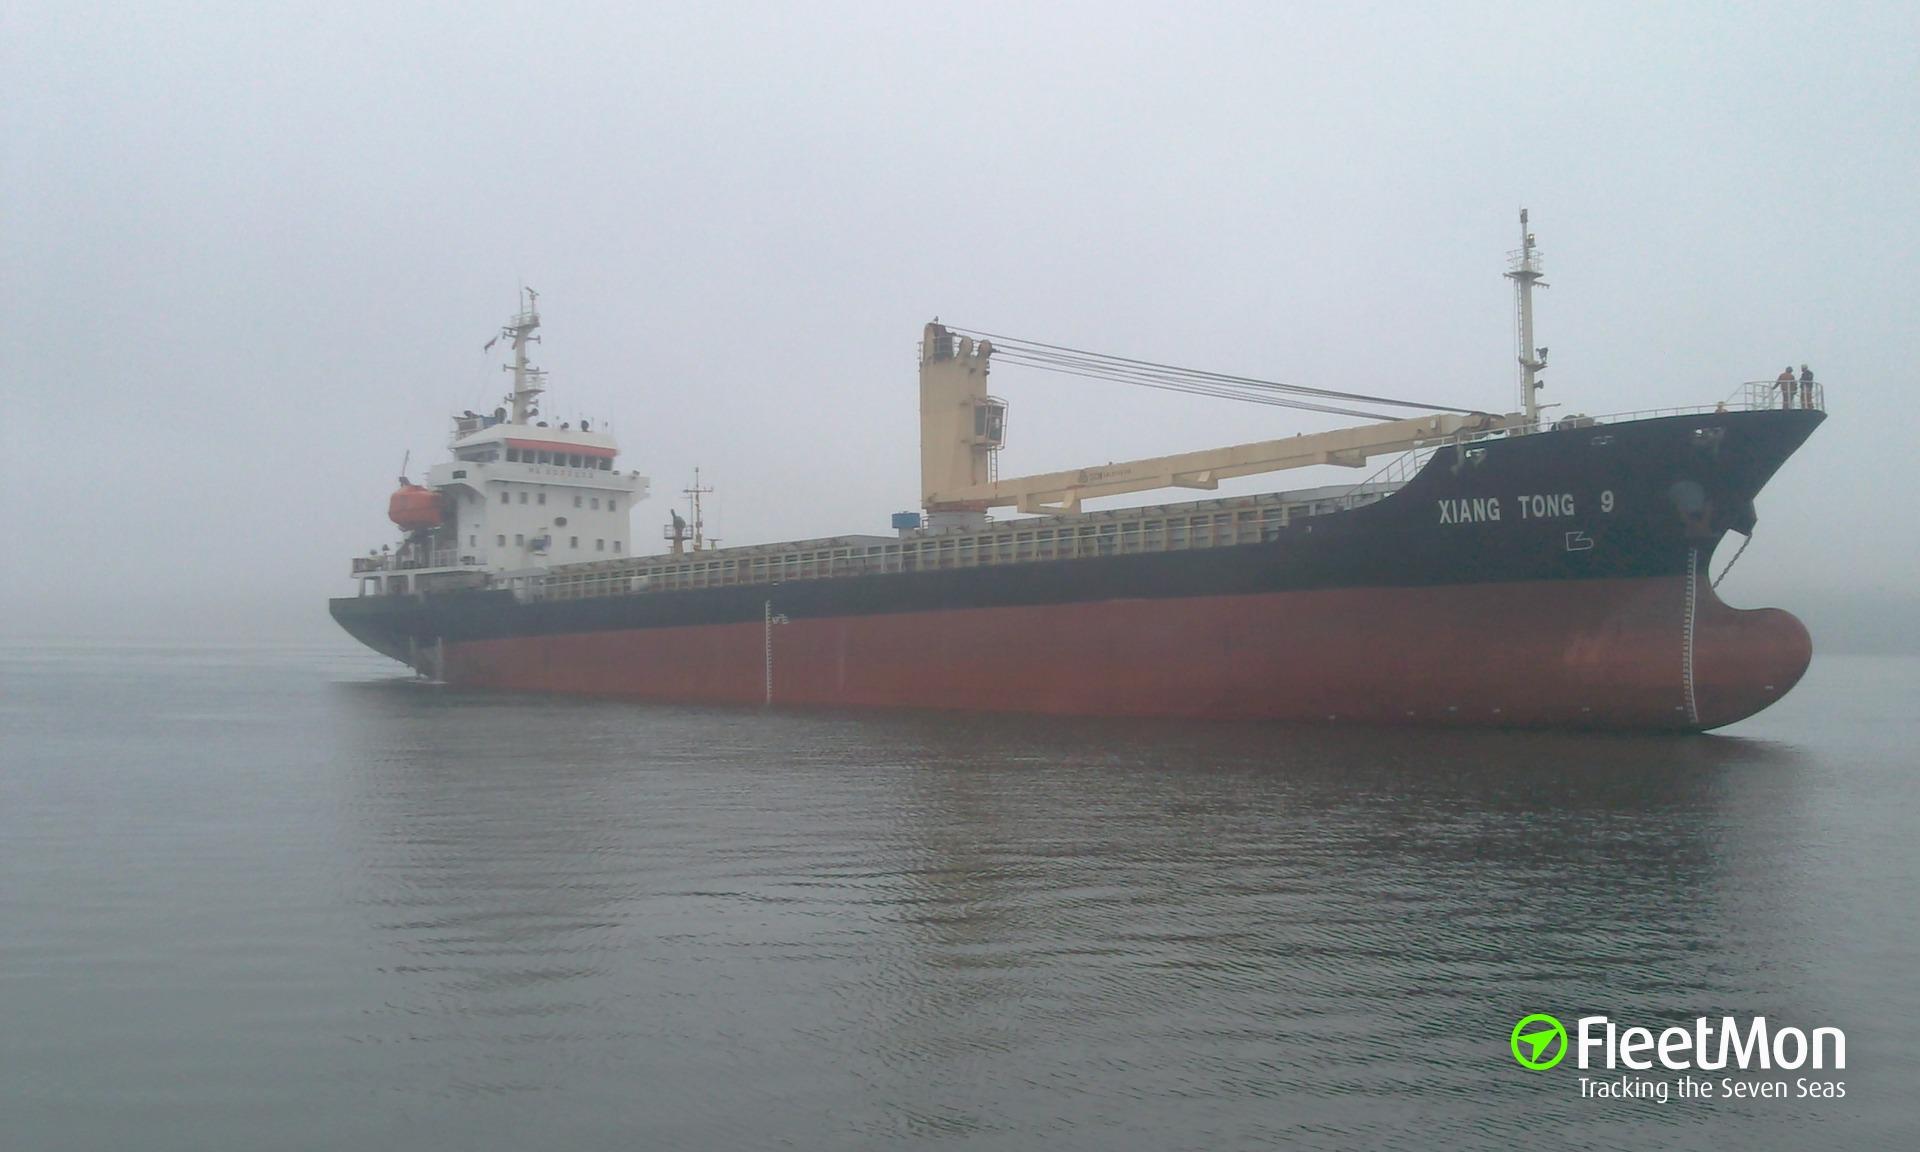 General cargo vessel Xiang Tong 9 grounding, Sakhalin